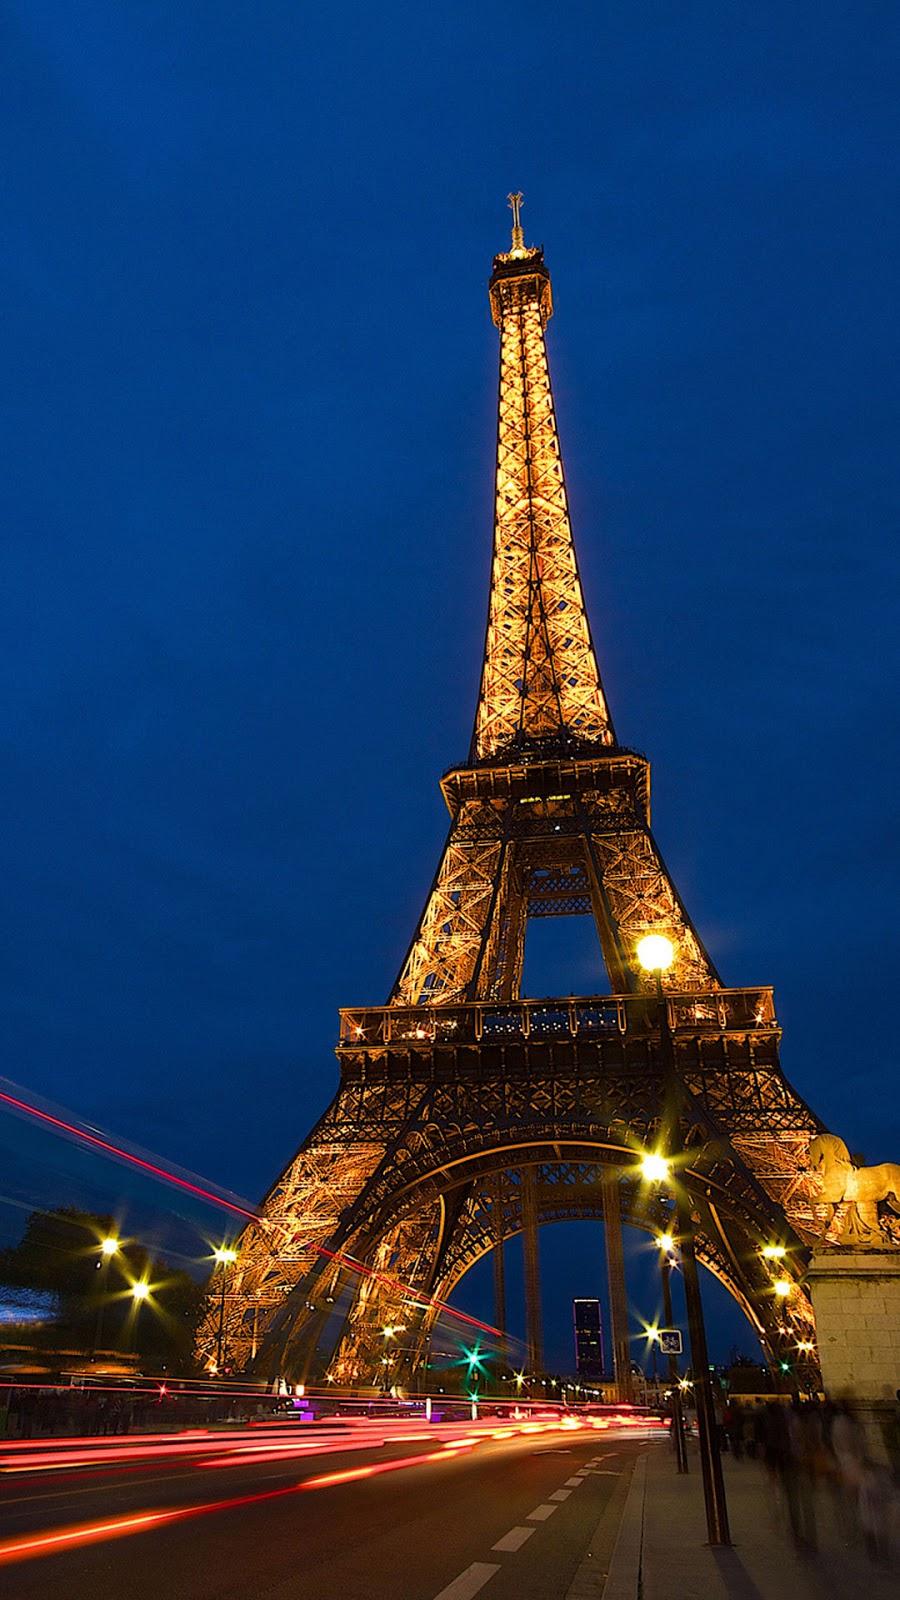 Wallpaper Android Menara Eiffel Malam Hari